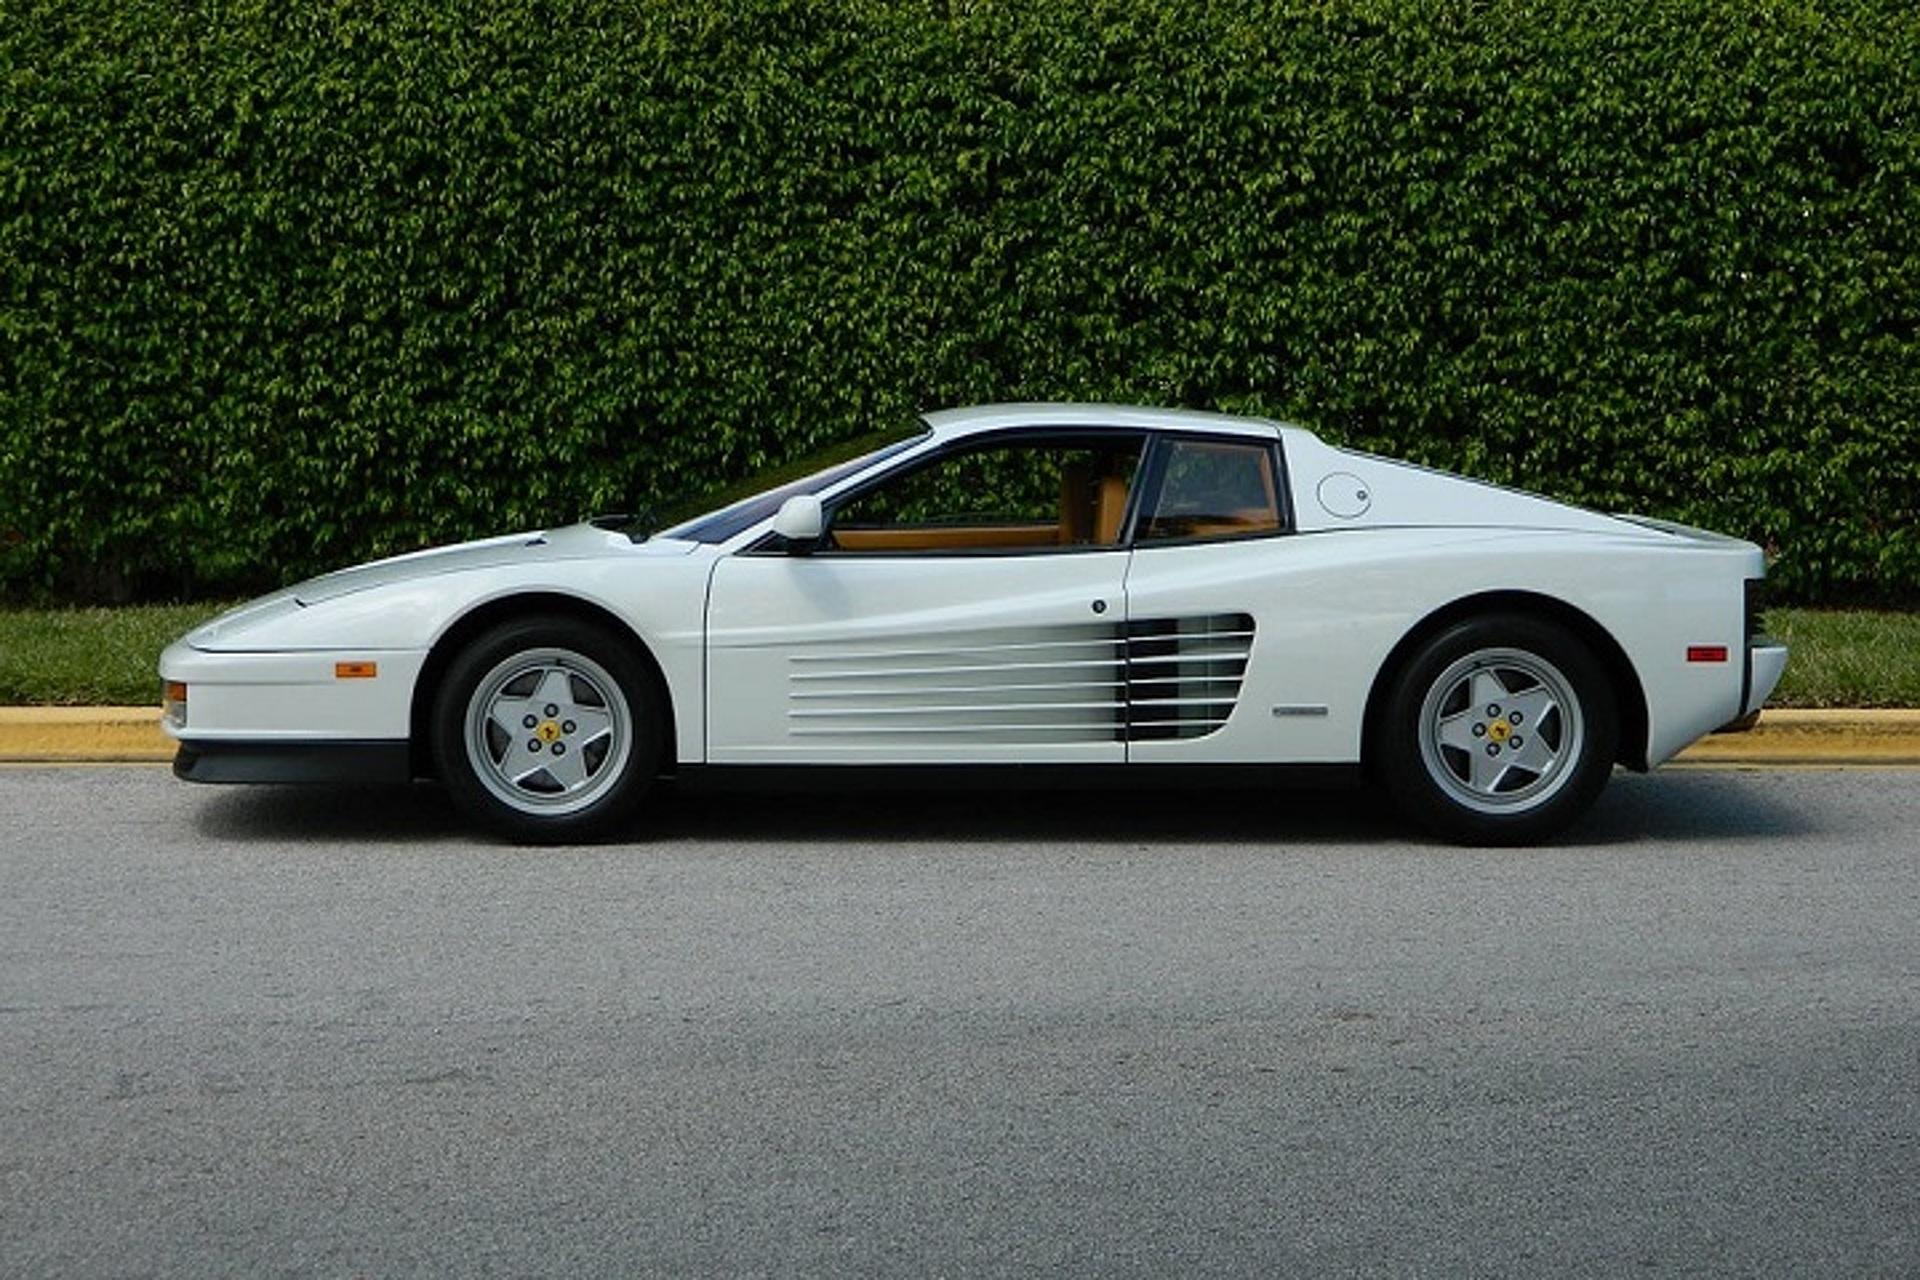 You Can Buy The Wolf of Wall Street's Ferrari Testarossa